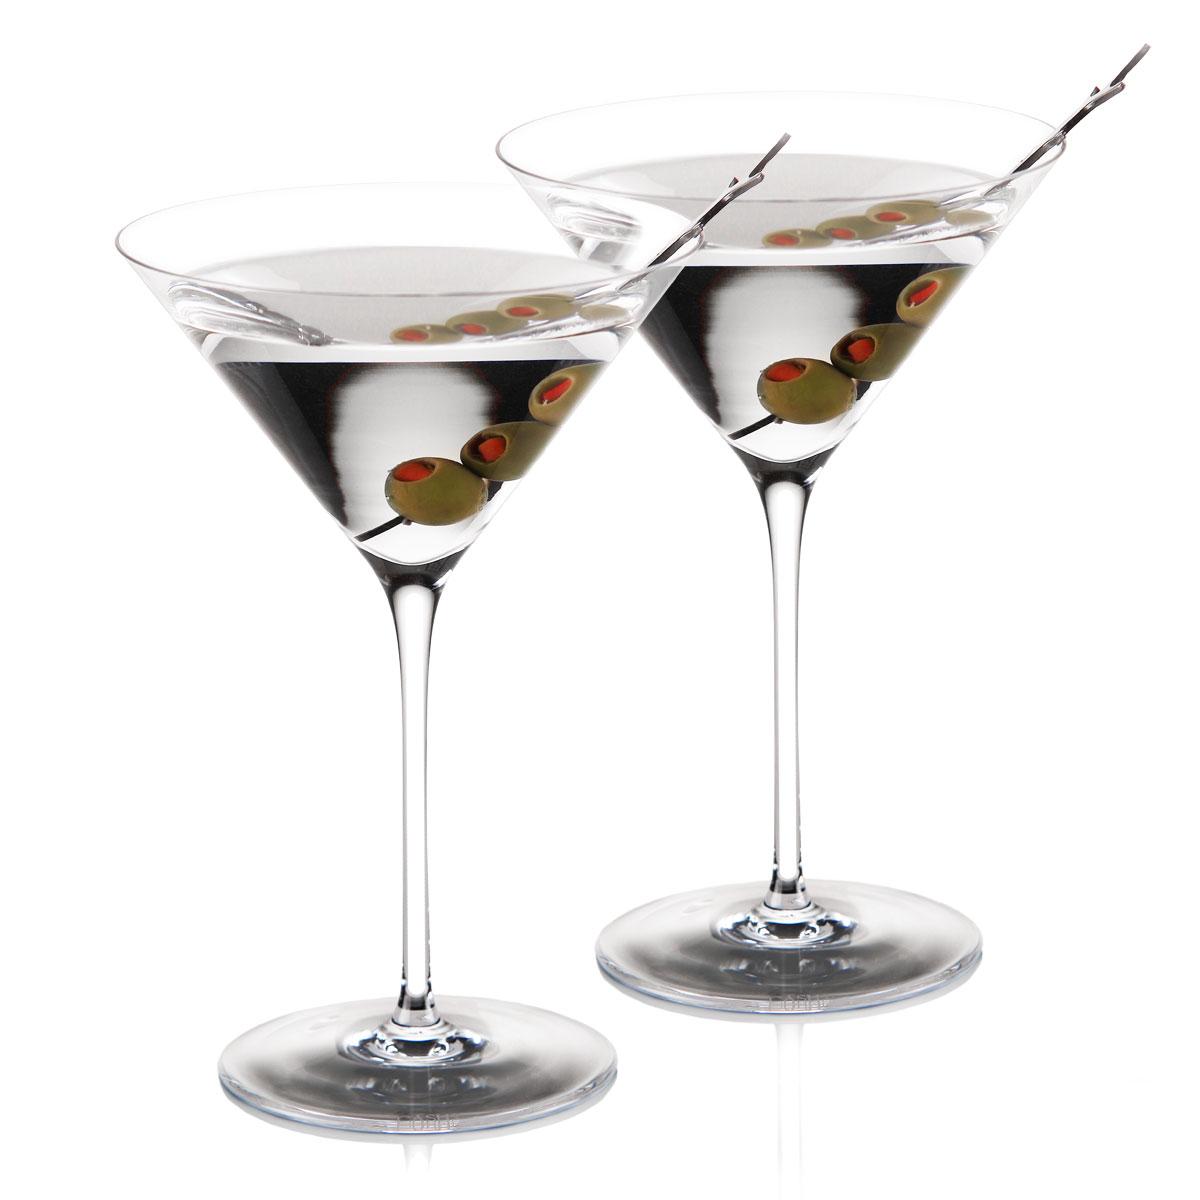 Cashs Ireland, Grand Cru Handmade Crystal, American Martini, Pair